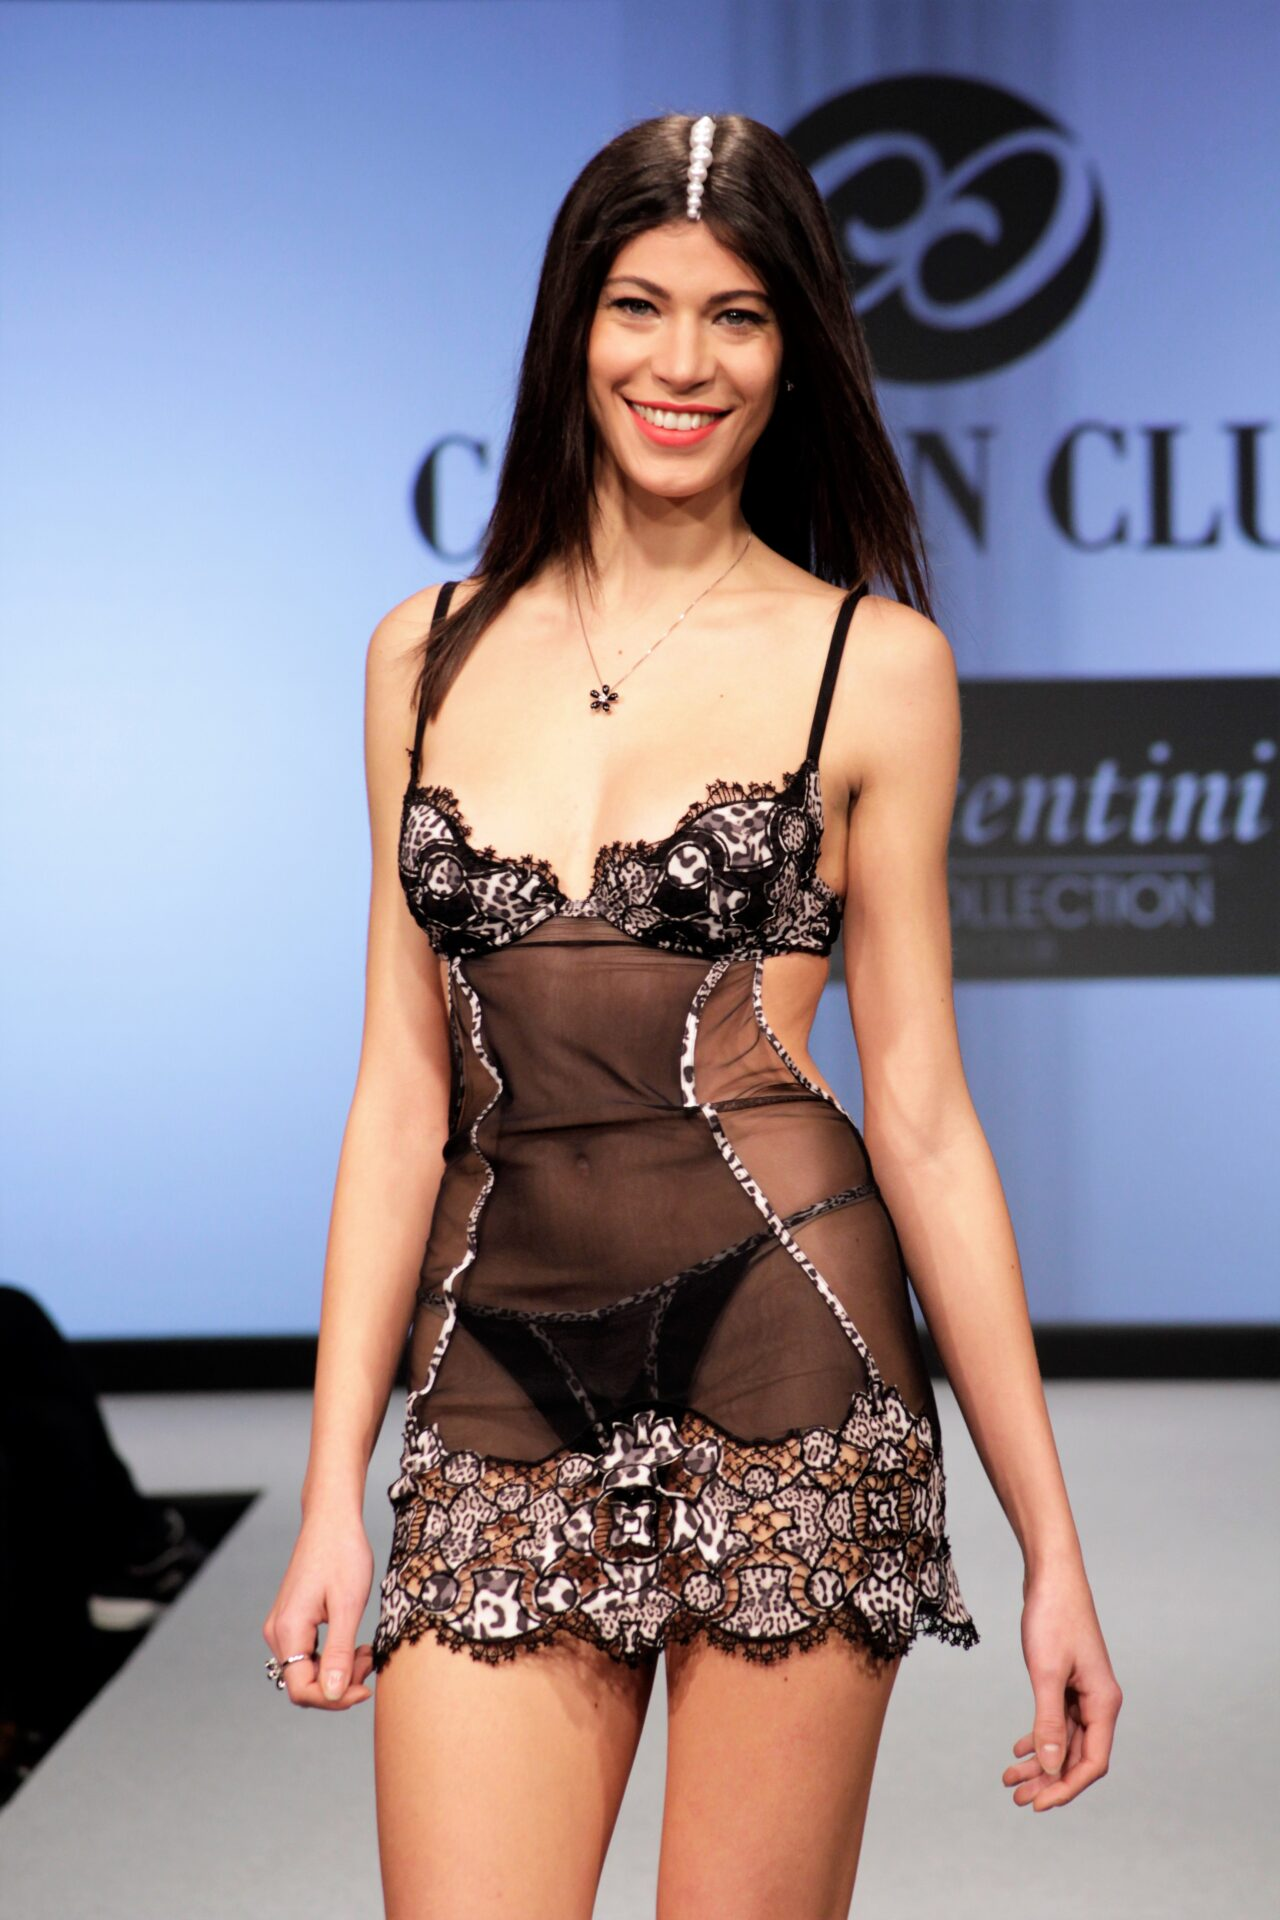 Modella in lingerie o intimo